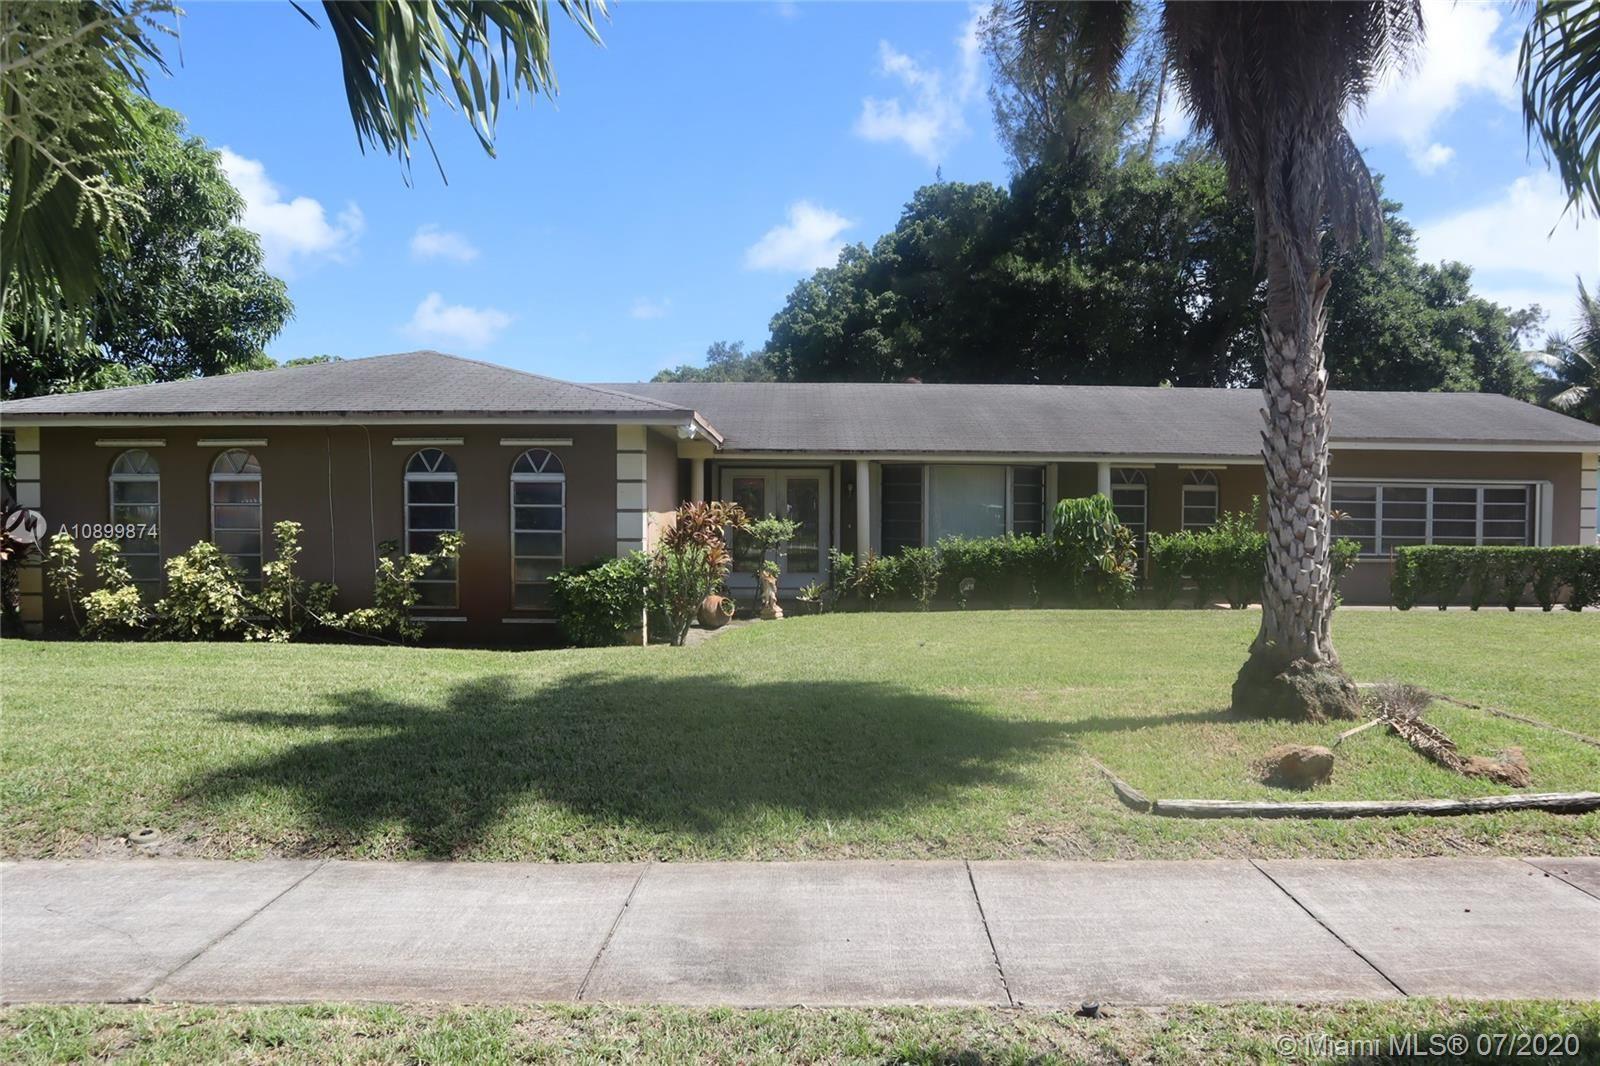 1920 NW 179th St, Miami Gardens, FL 33056 - #: A10899874